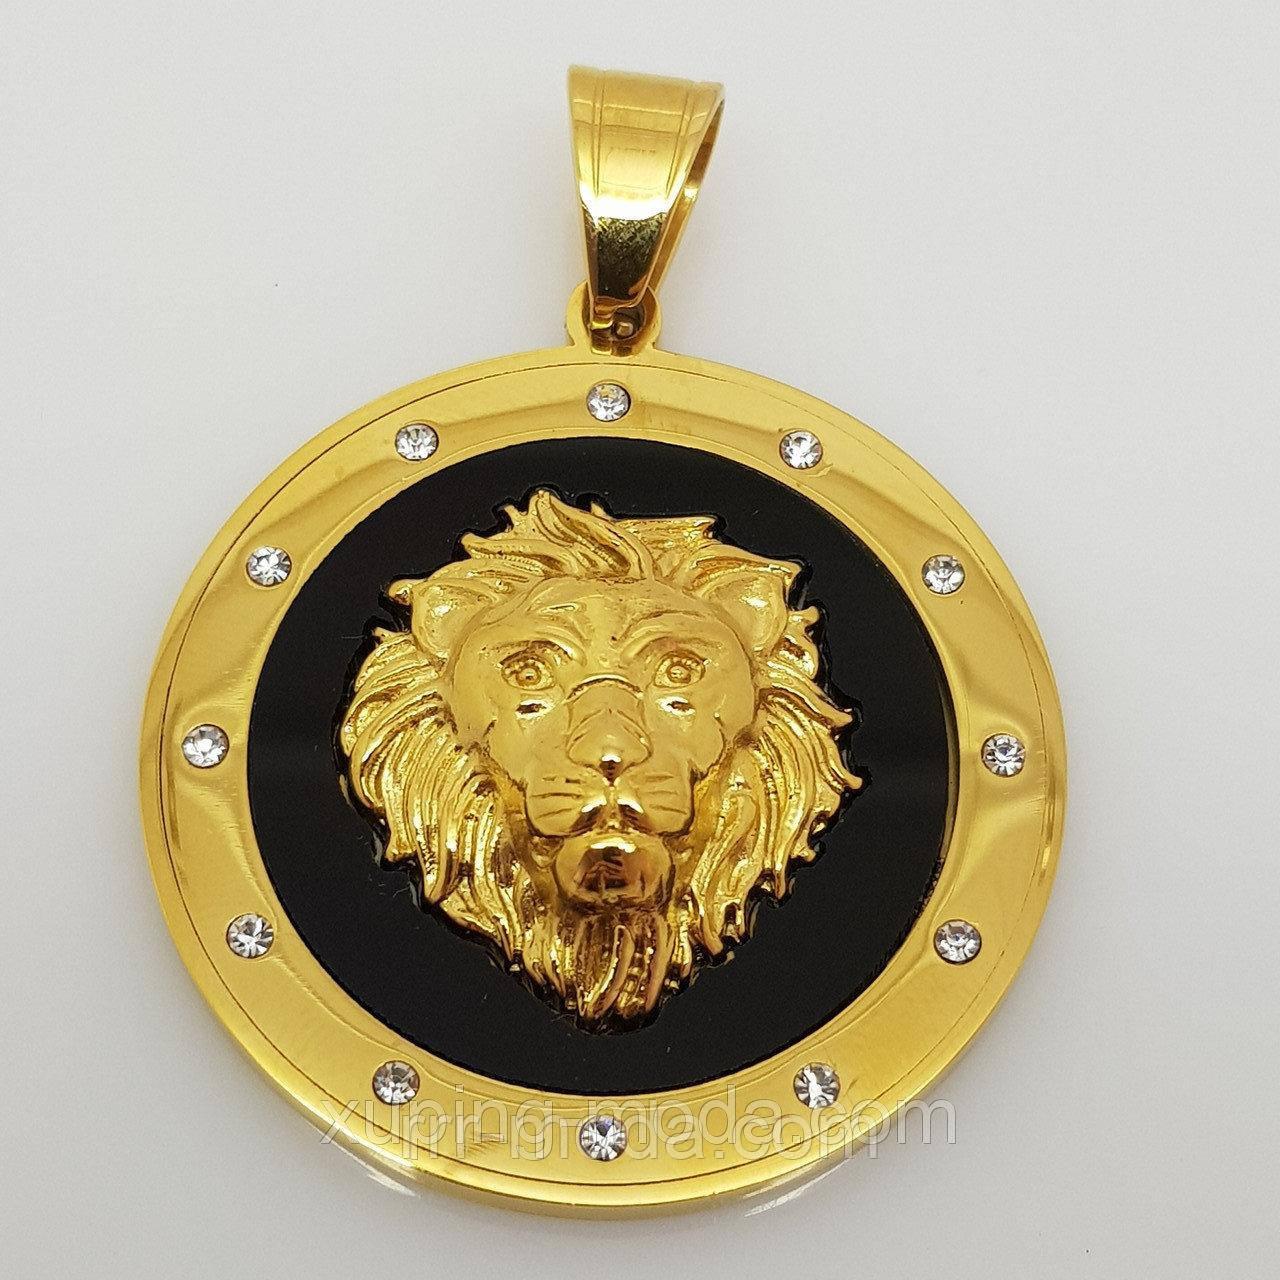 453. Брендовые кулоны - ювелирная бижутерия оптом. Кулоны Xuping Jewelry